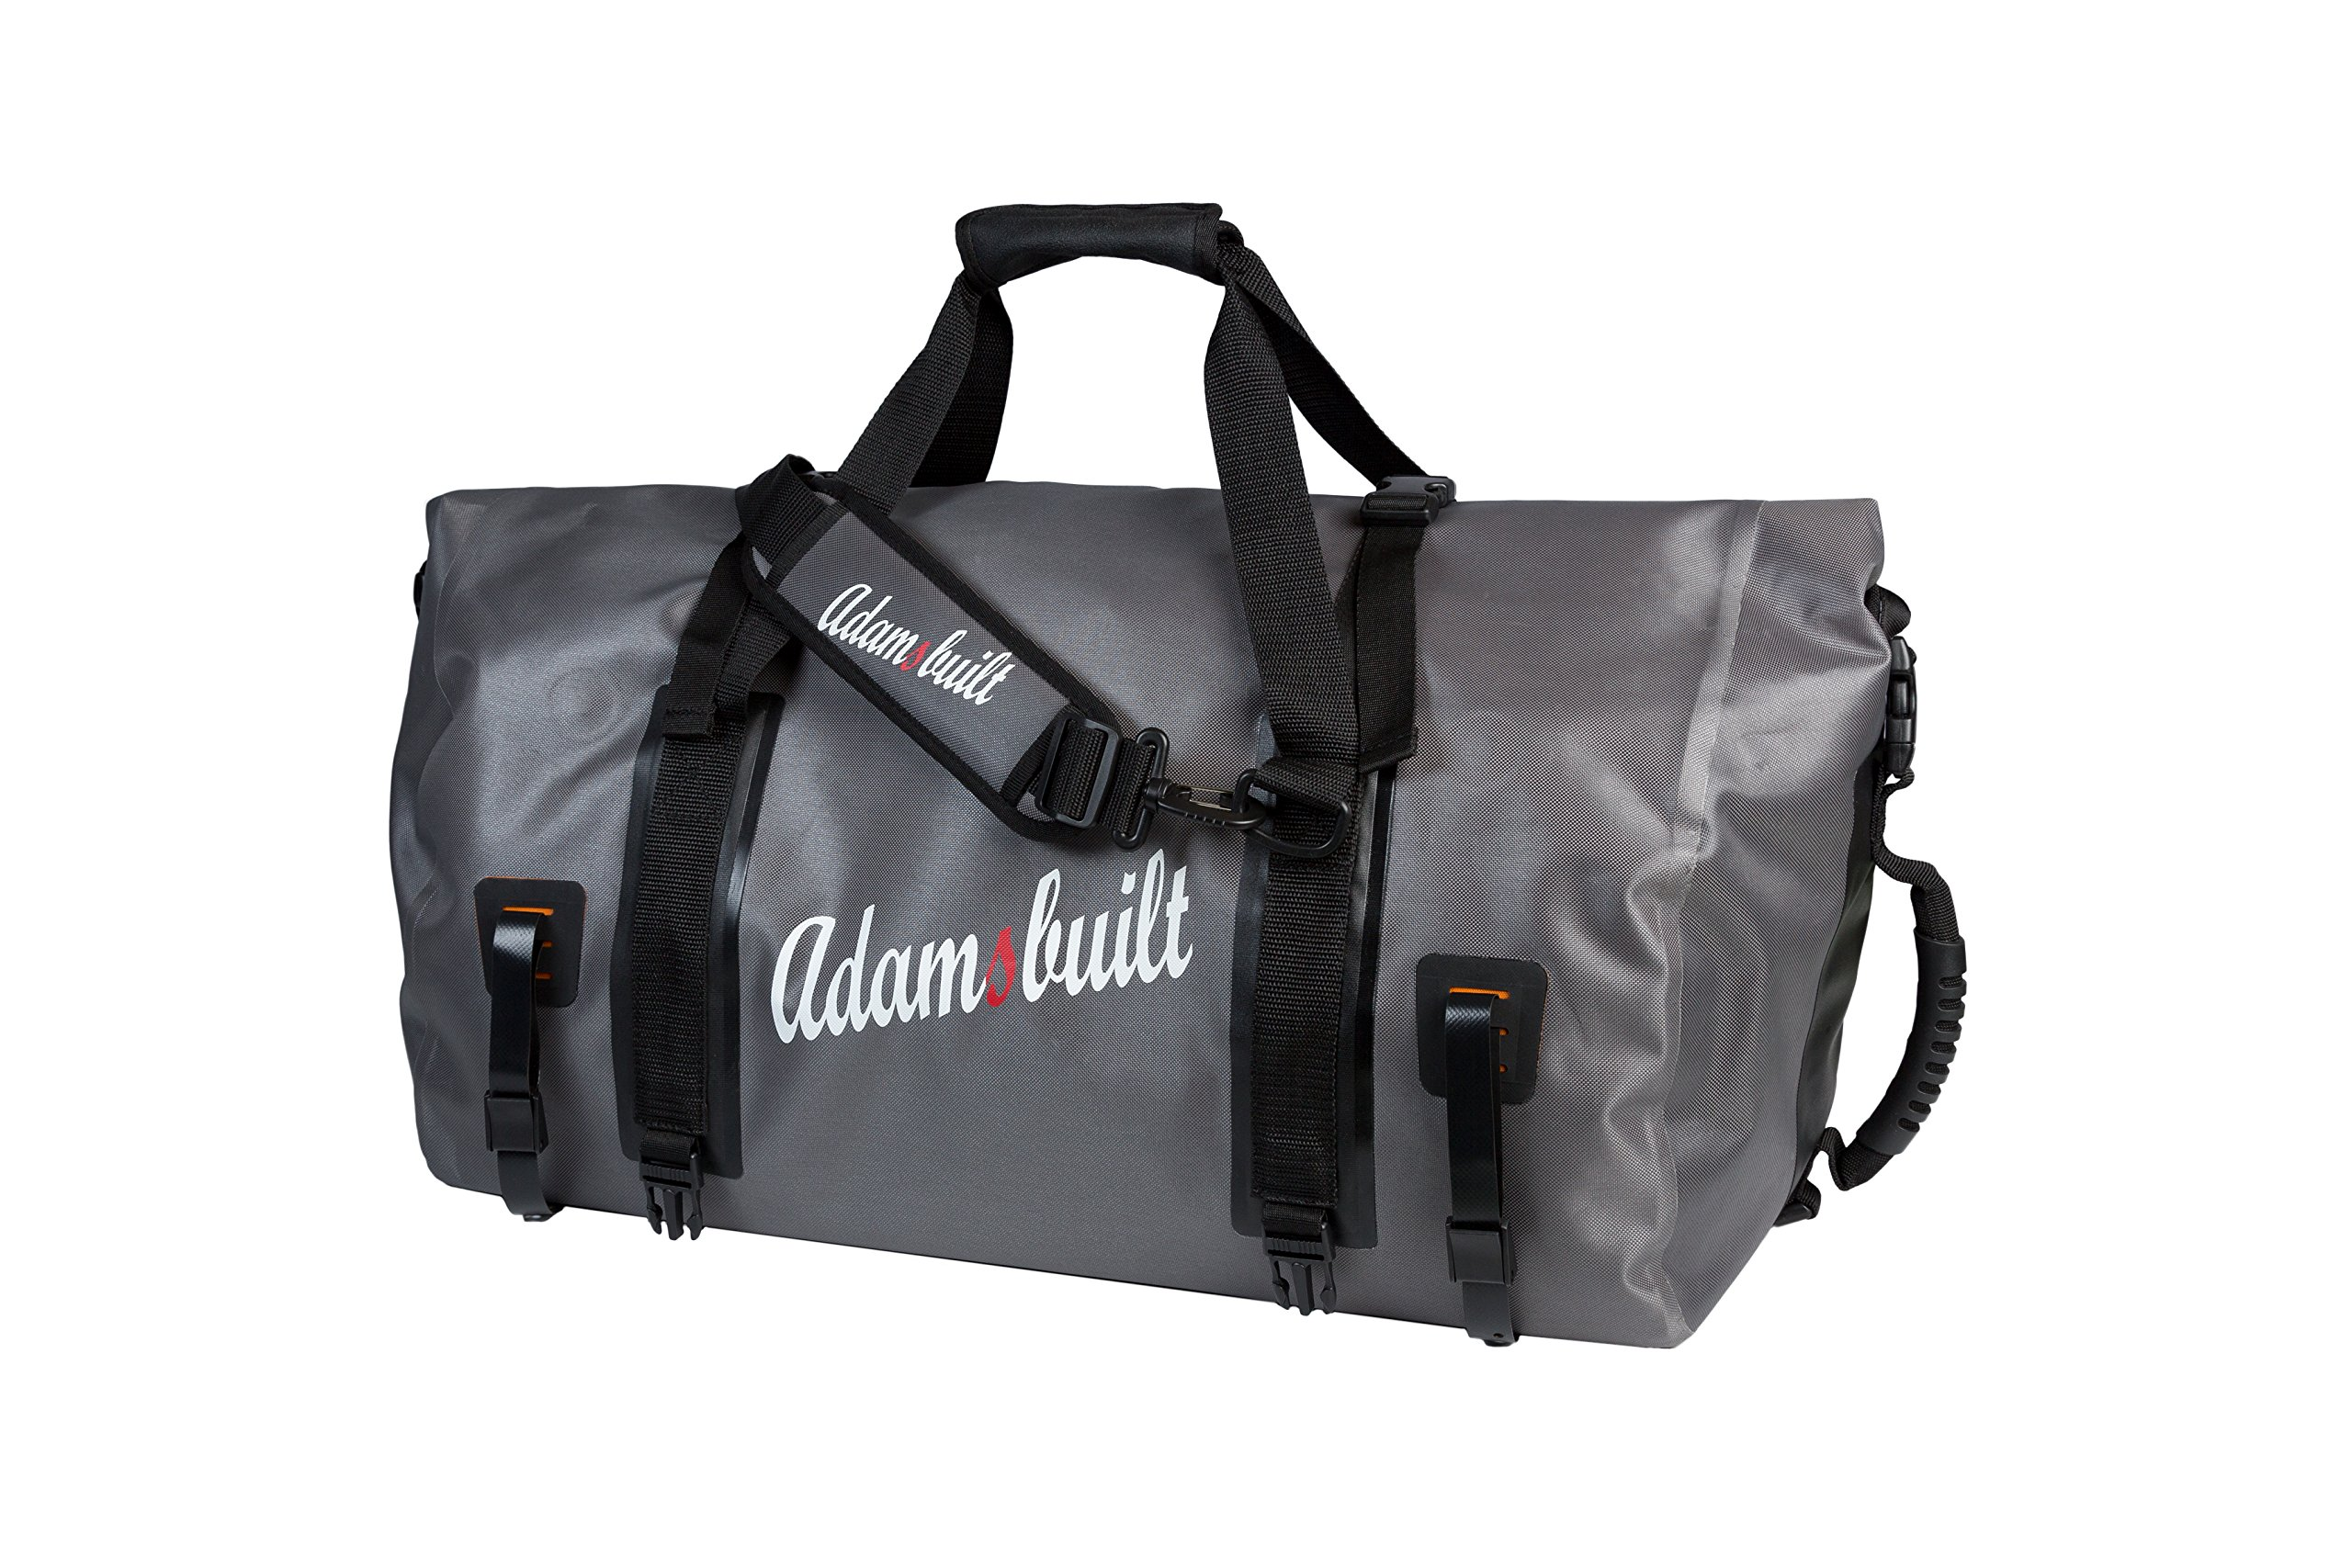 Adamsbuilt Schell Creek Duffel Bag - Gray/Black